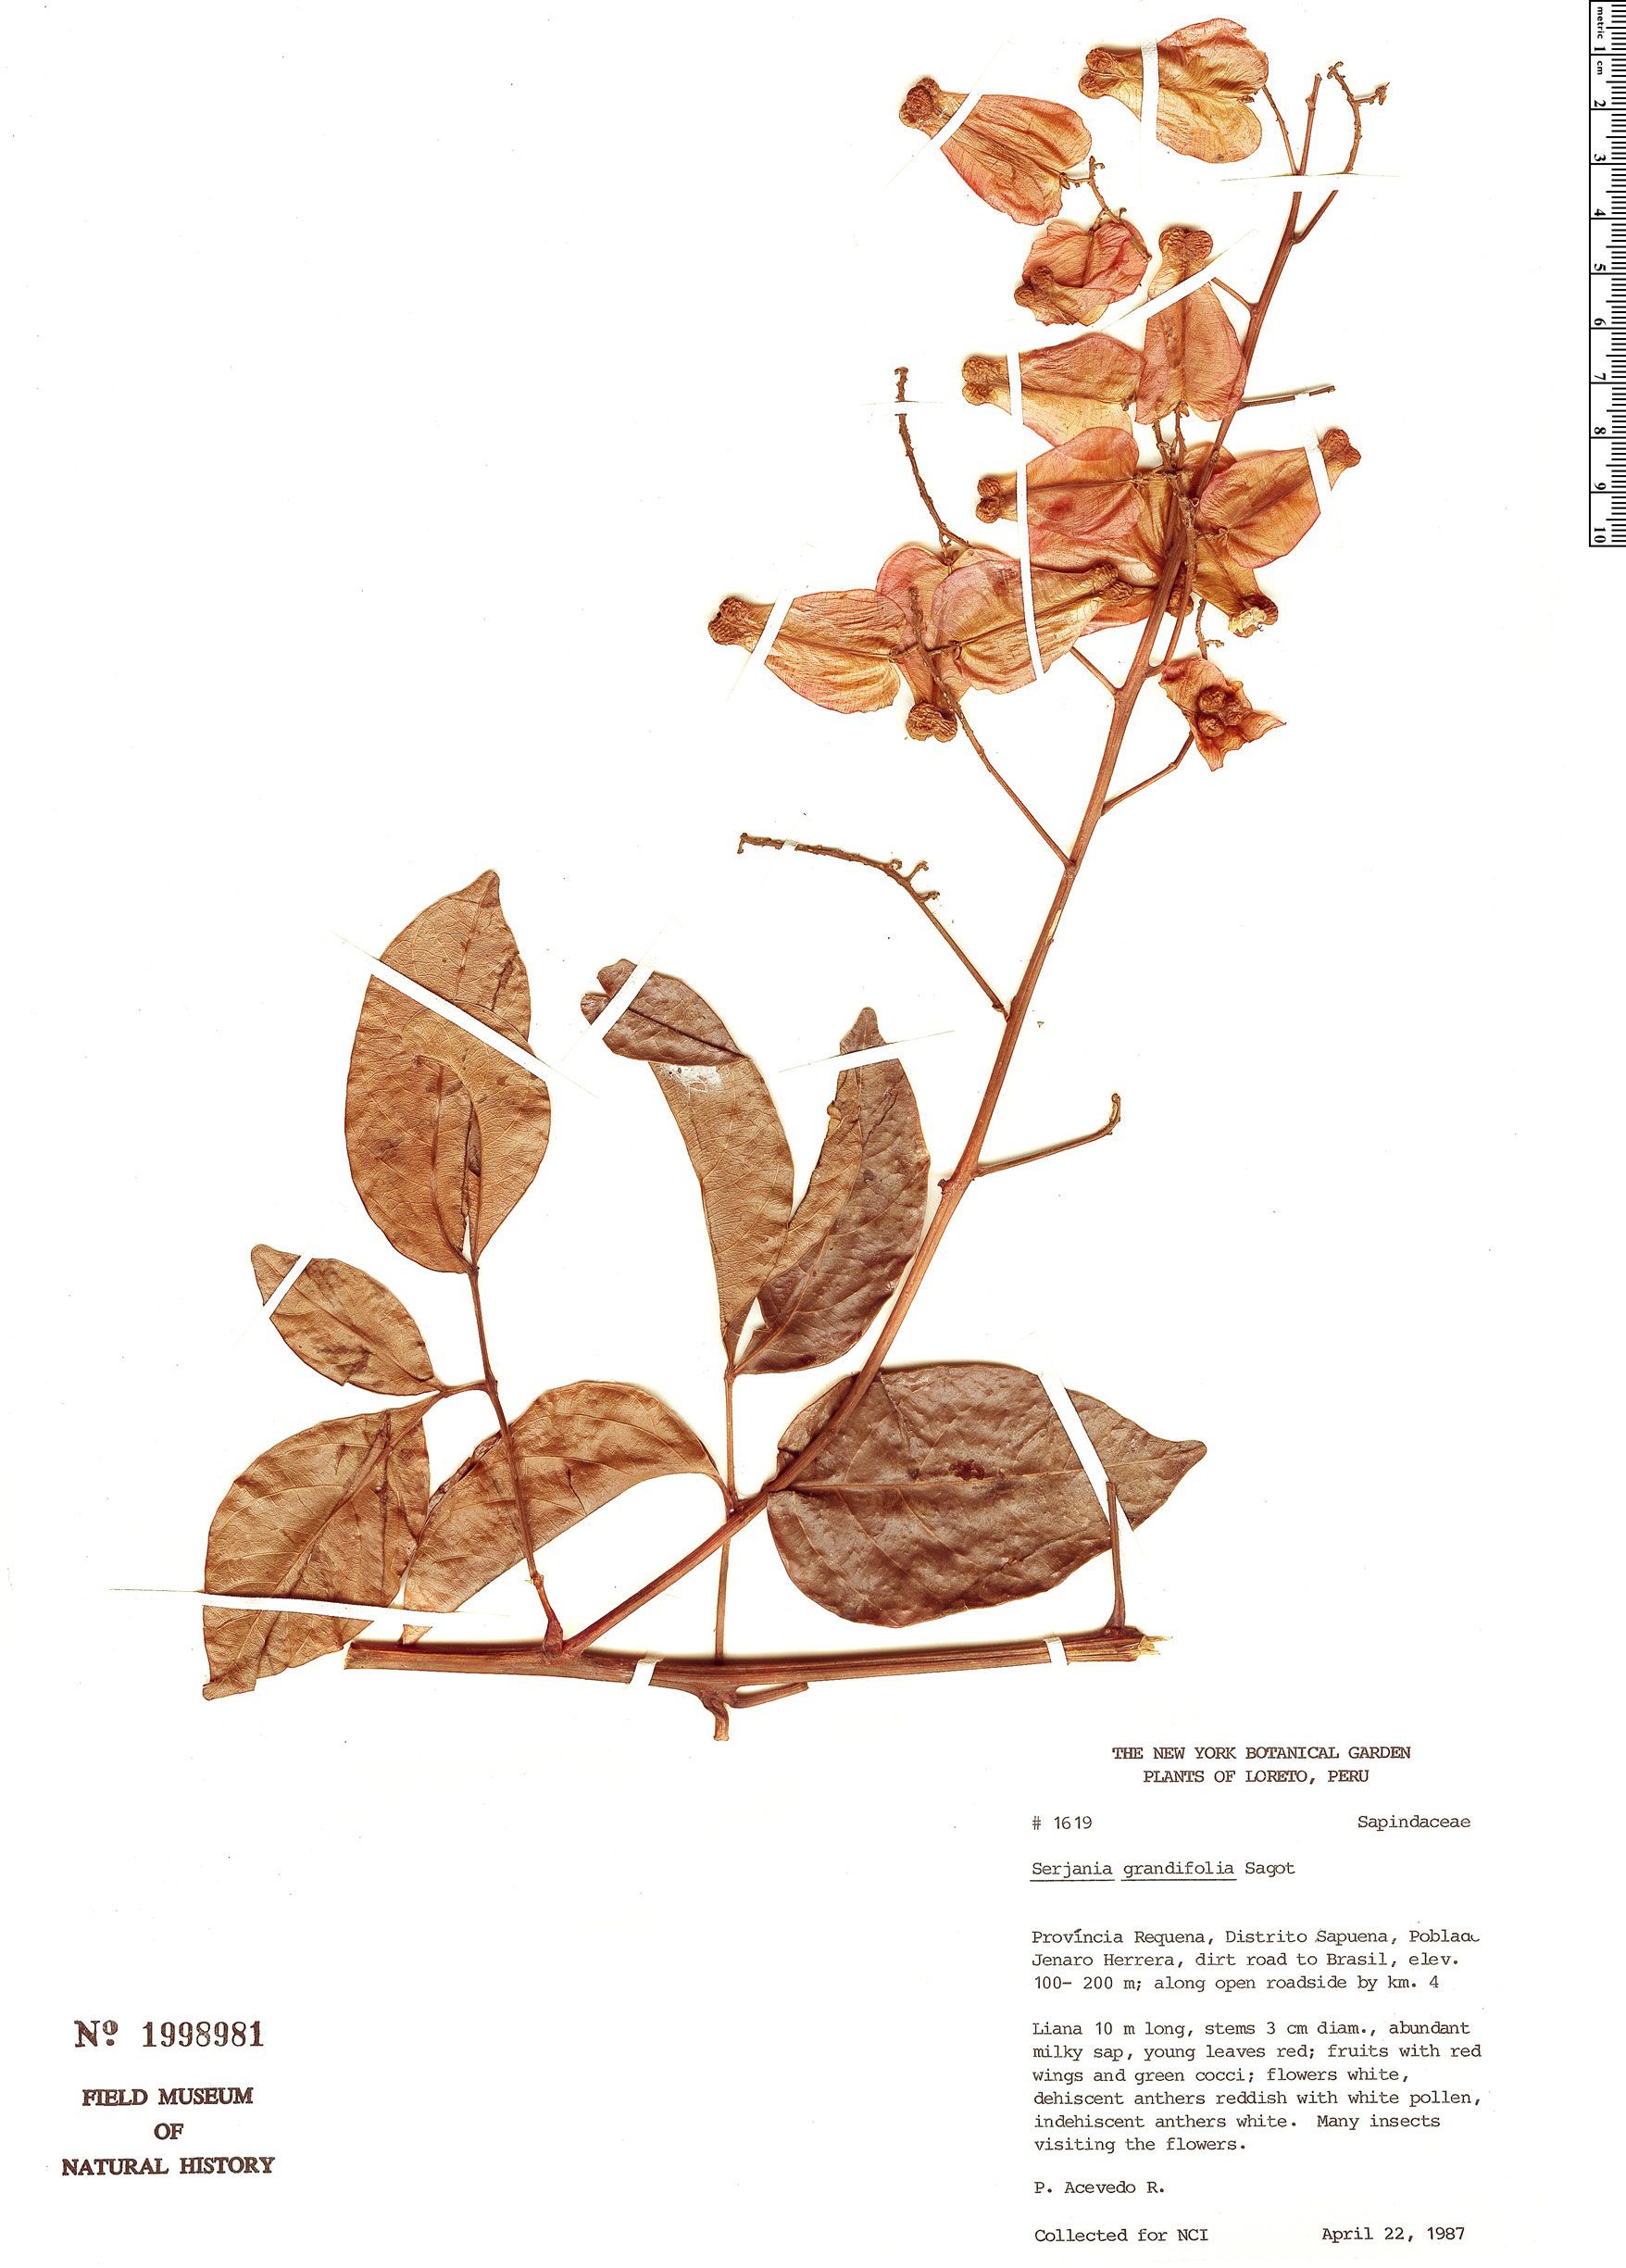 Specimen: Serjania grandifolia